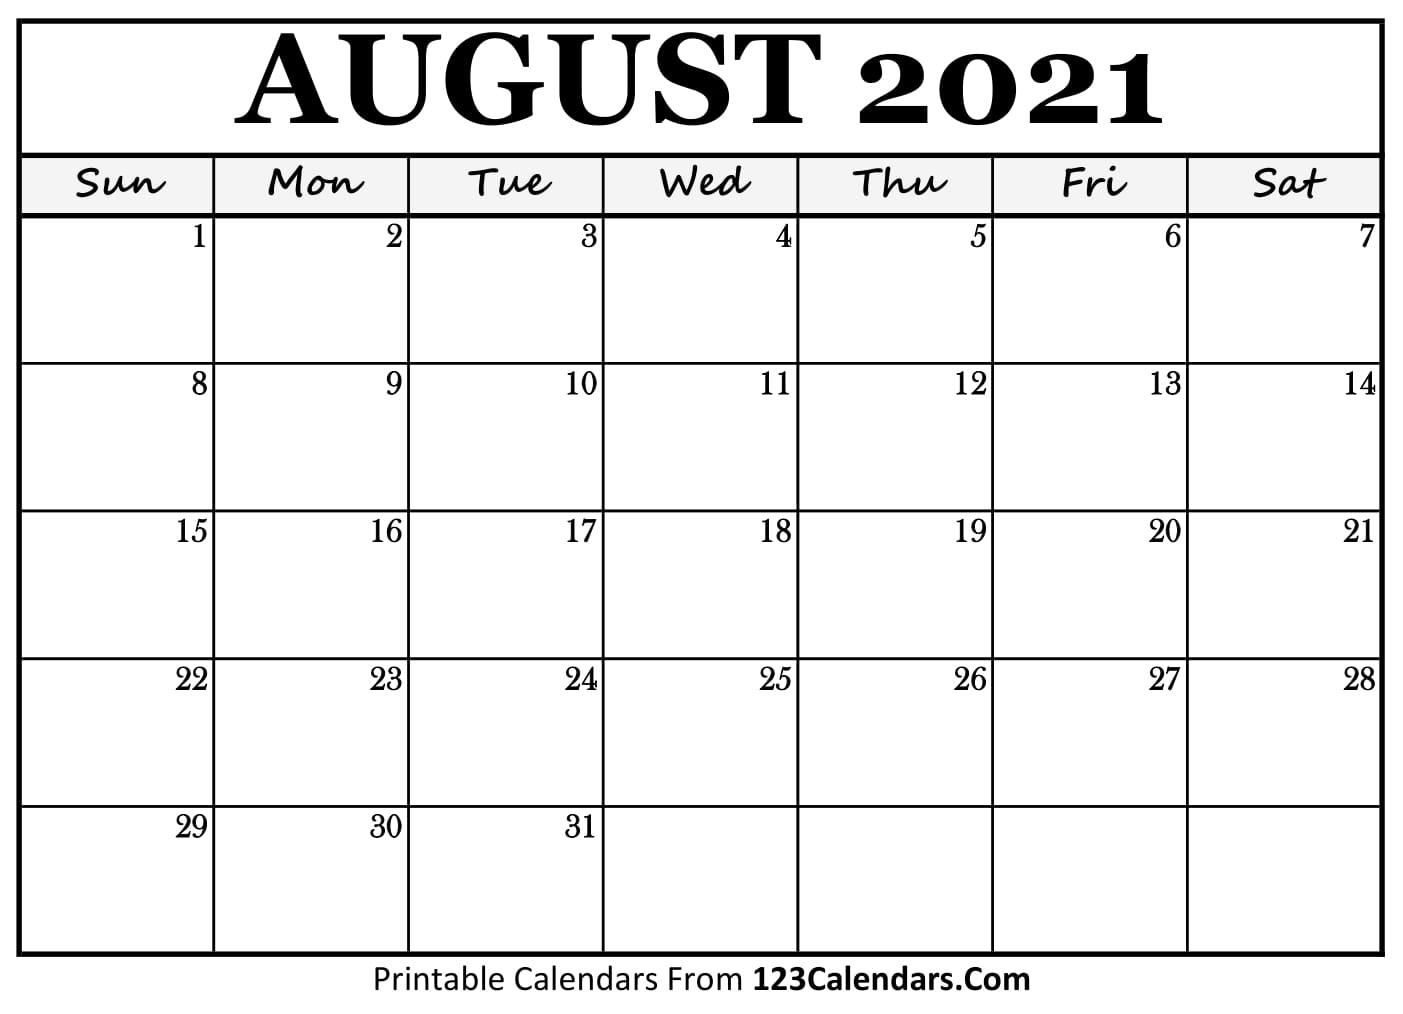 Printable August 2021 Calendar Templates - 123Calendars Printable Calendar August 2020 To May 2021